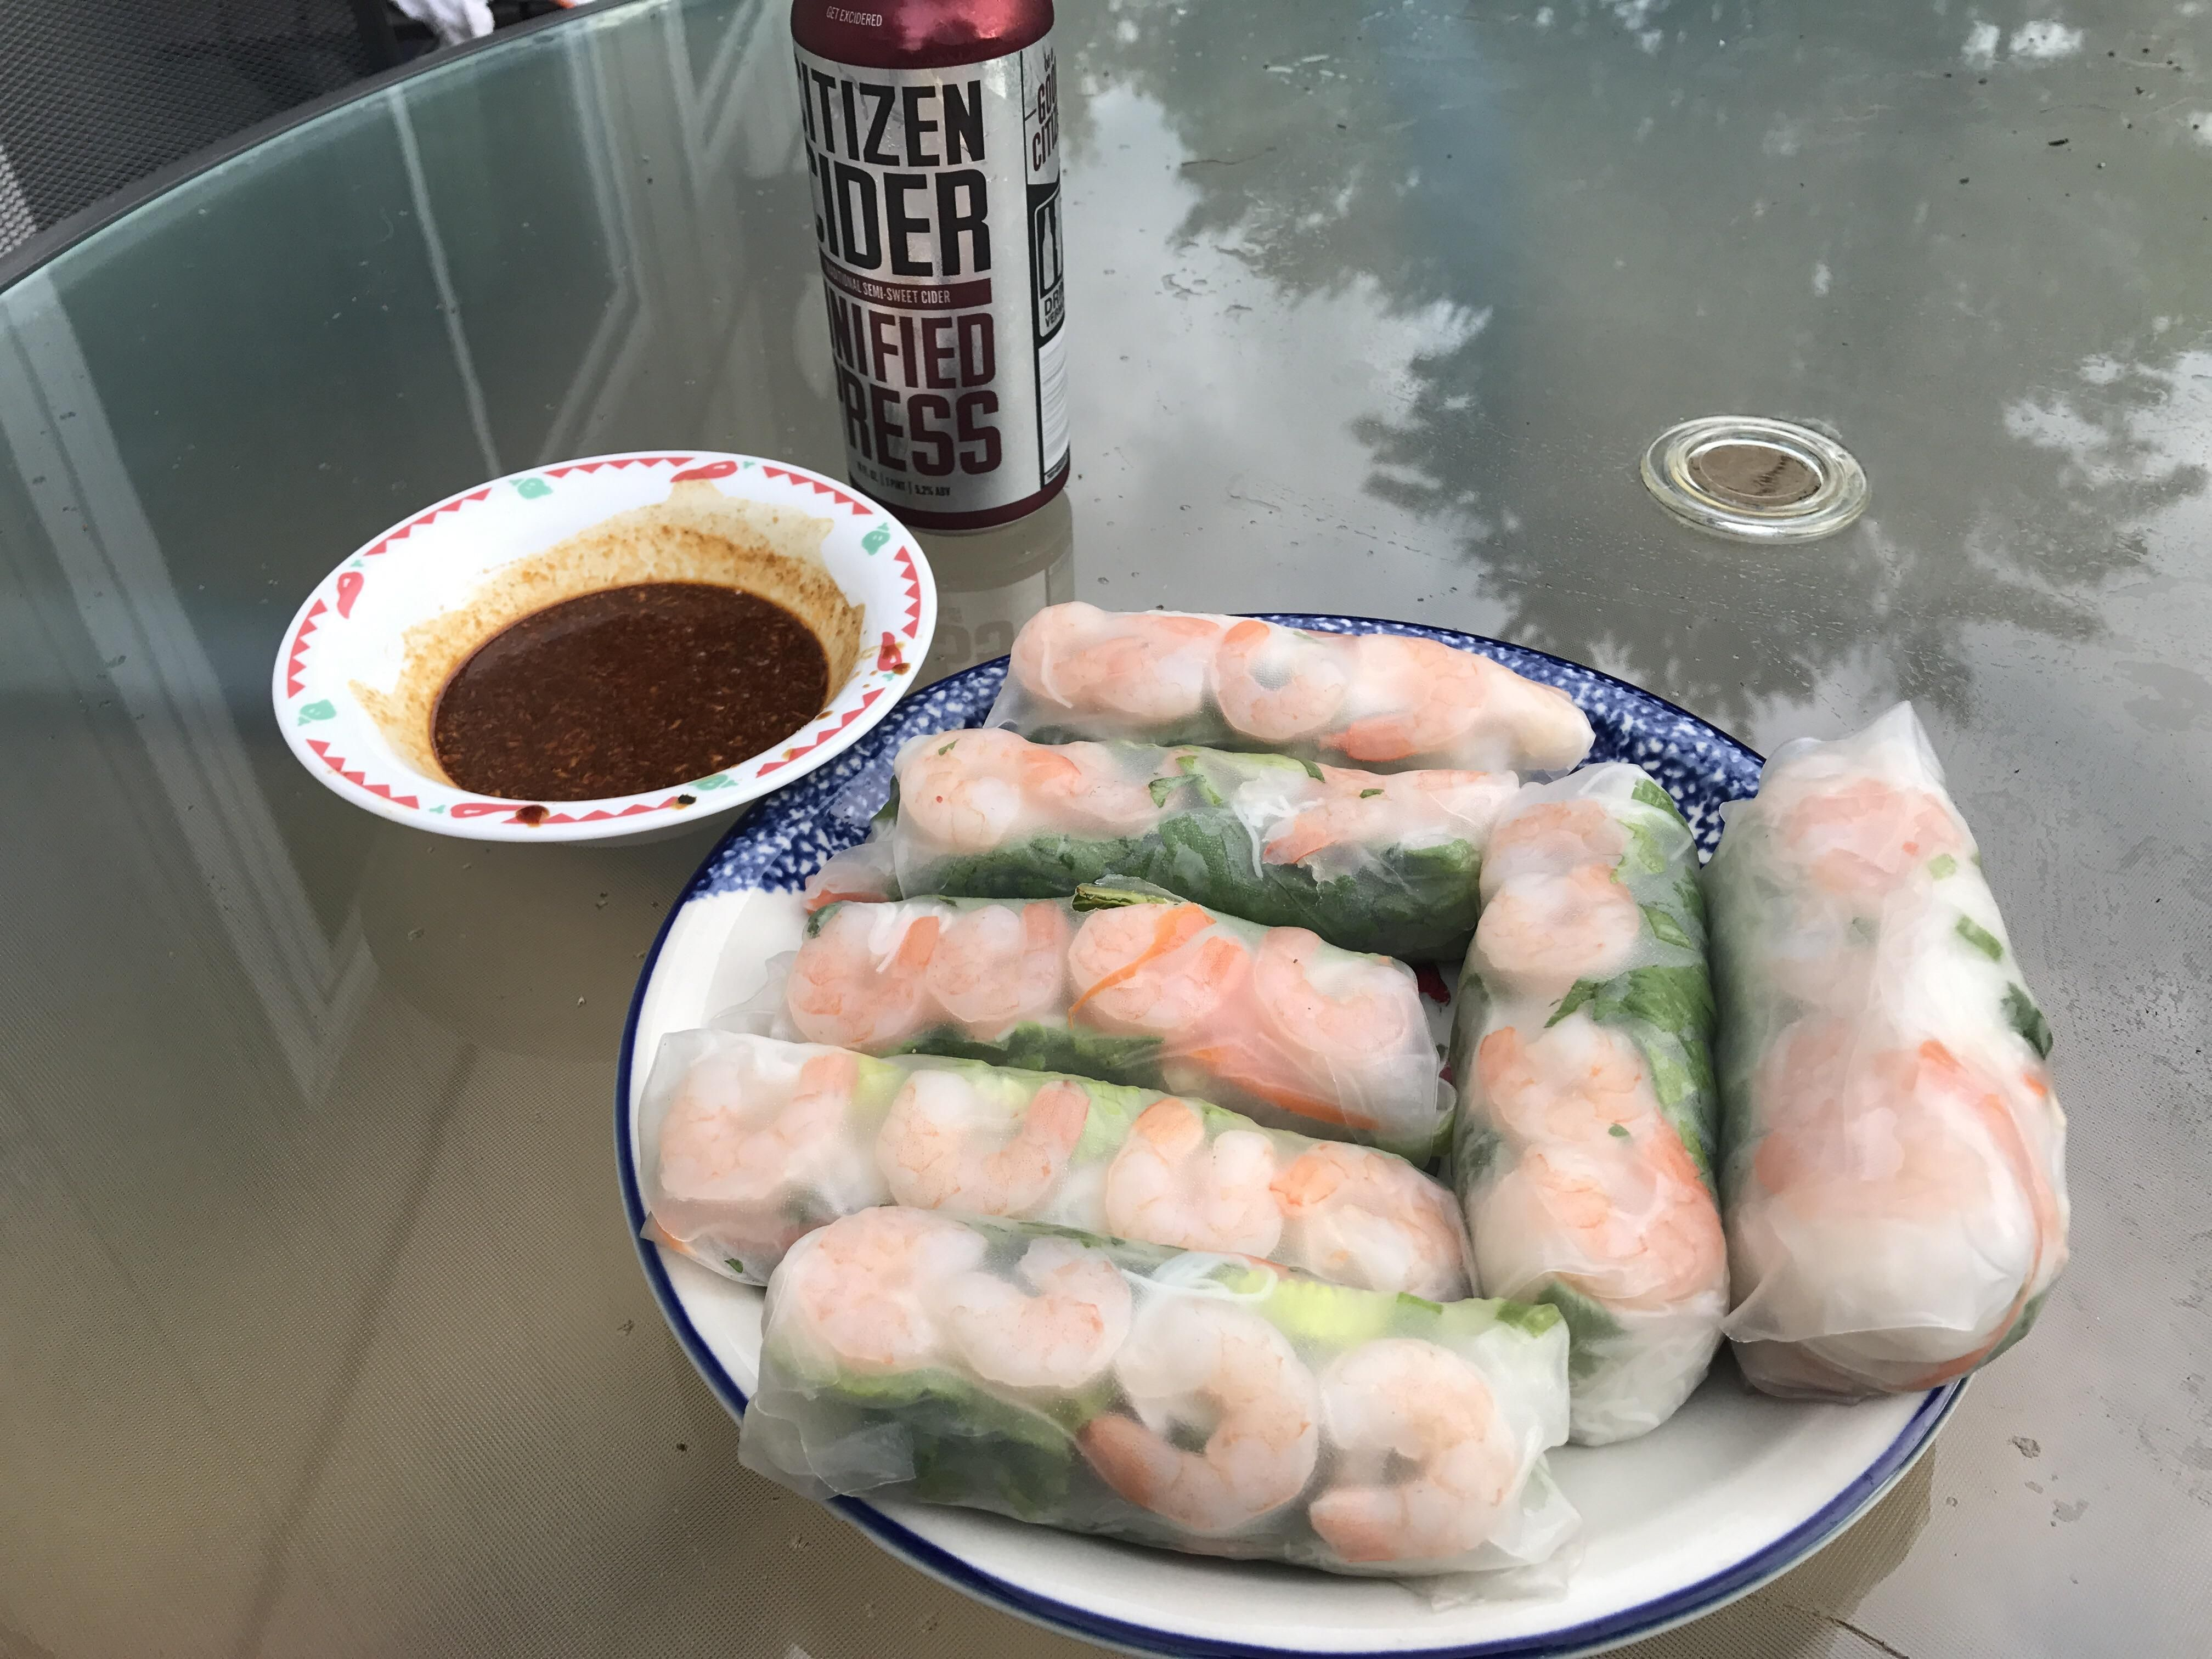 [homemade] Shrimp spring rolls with peanut butter sauce